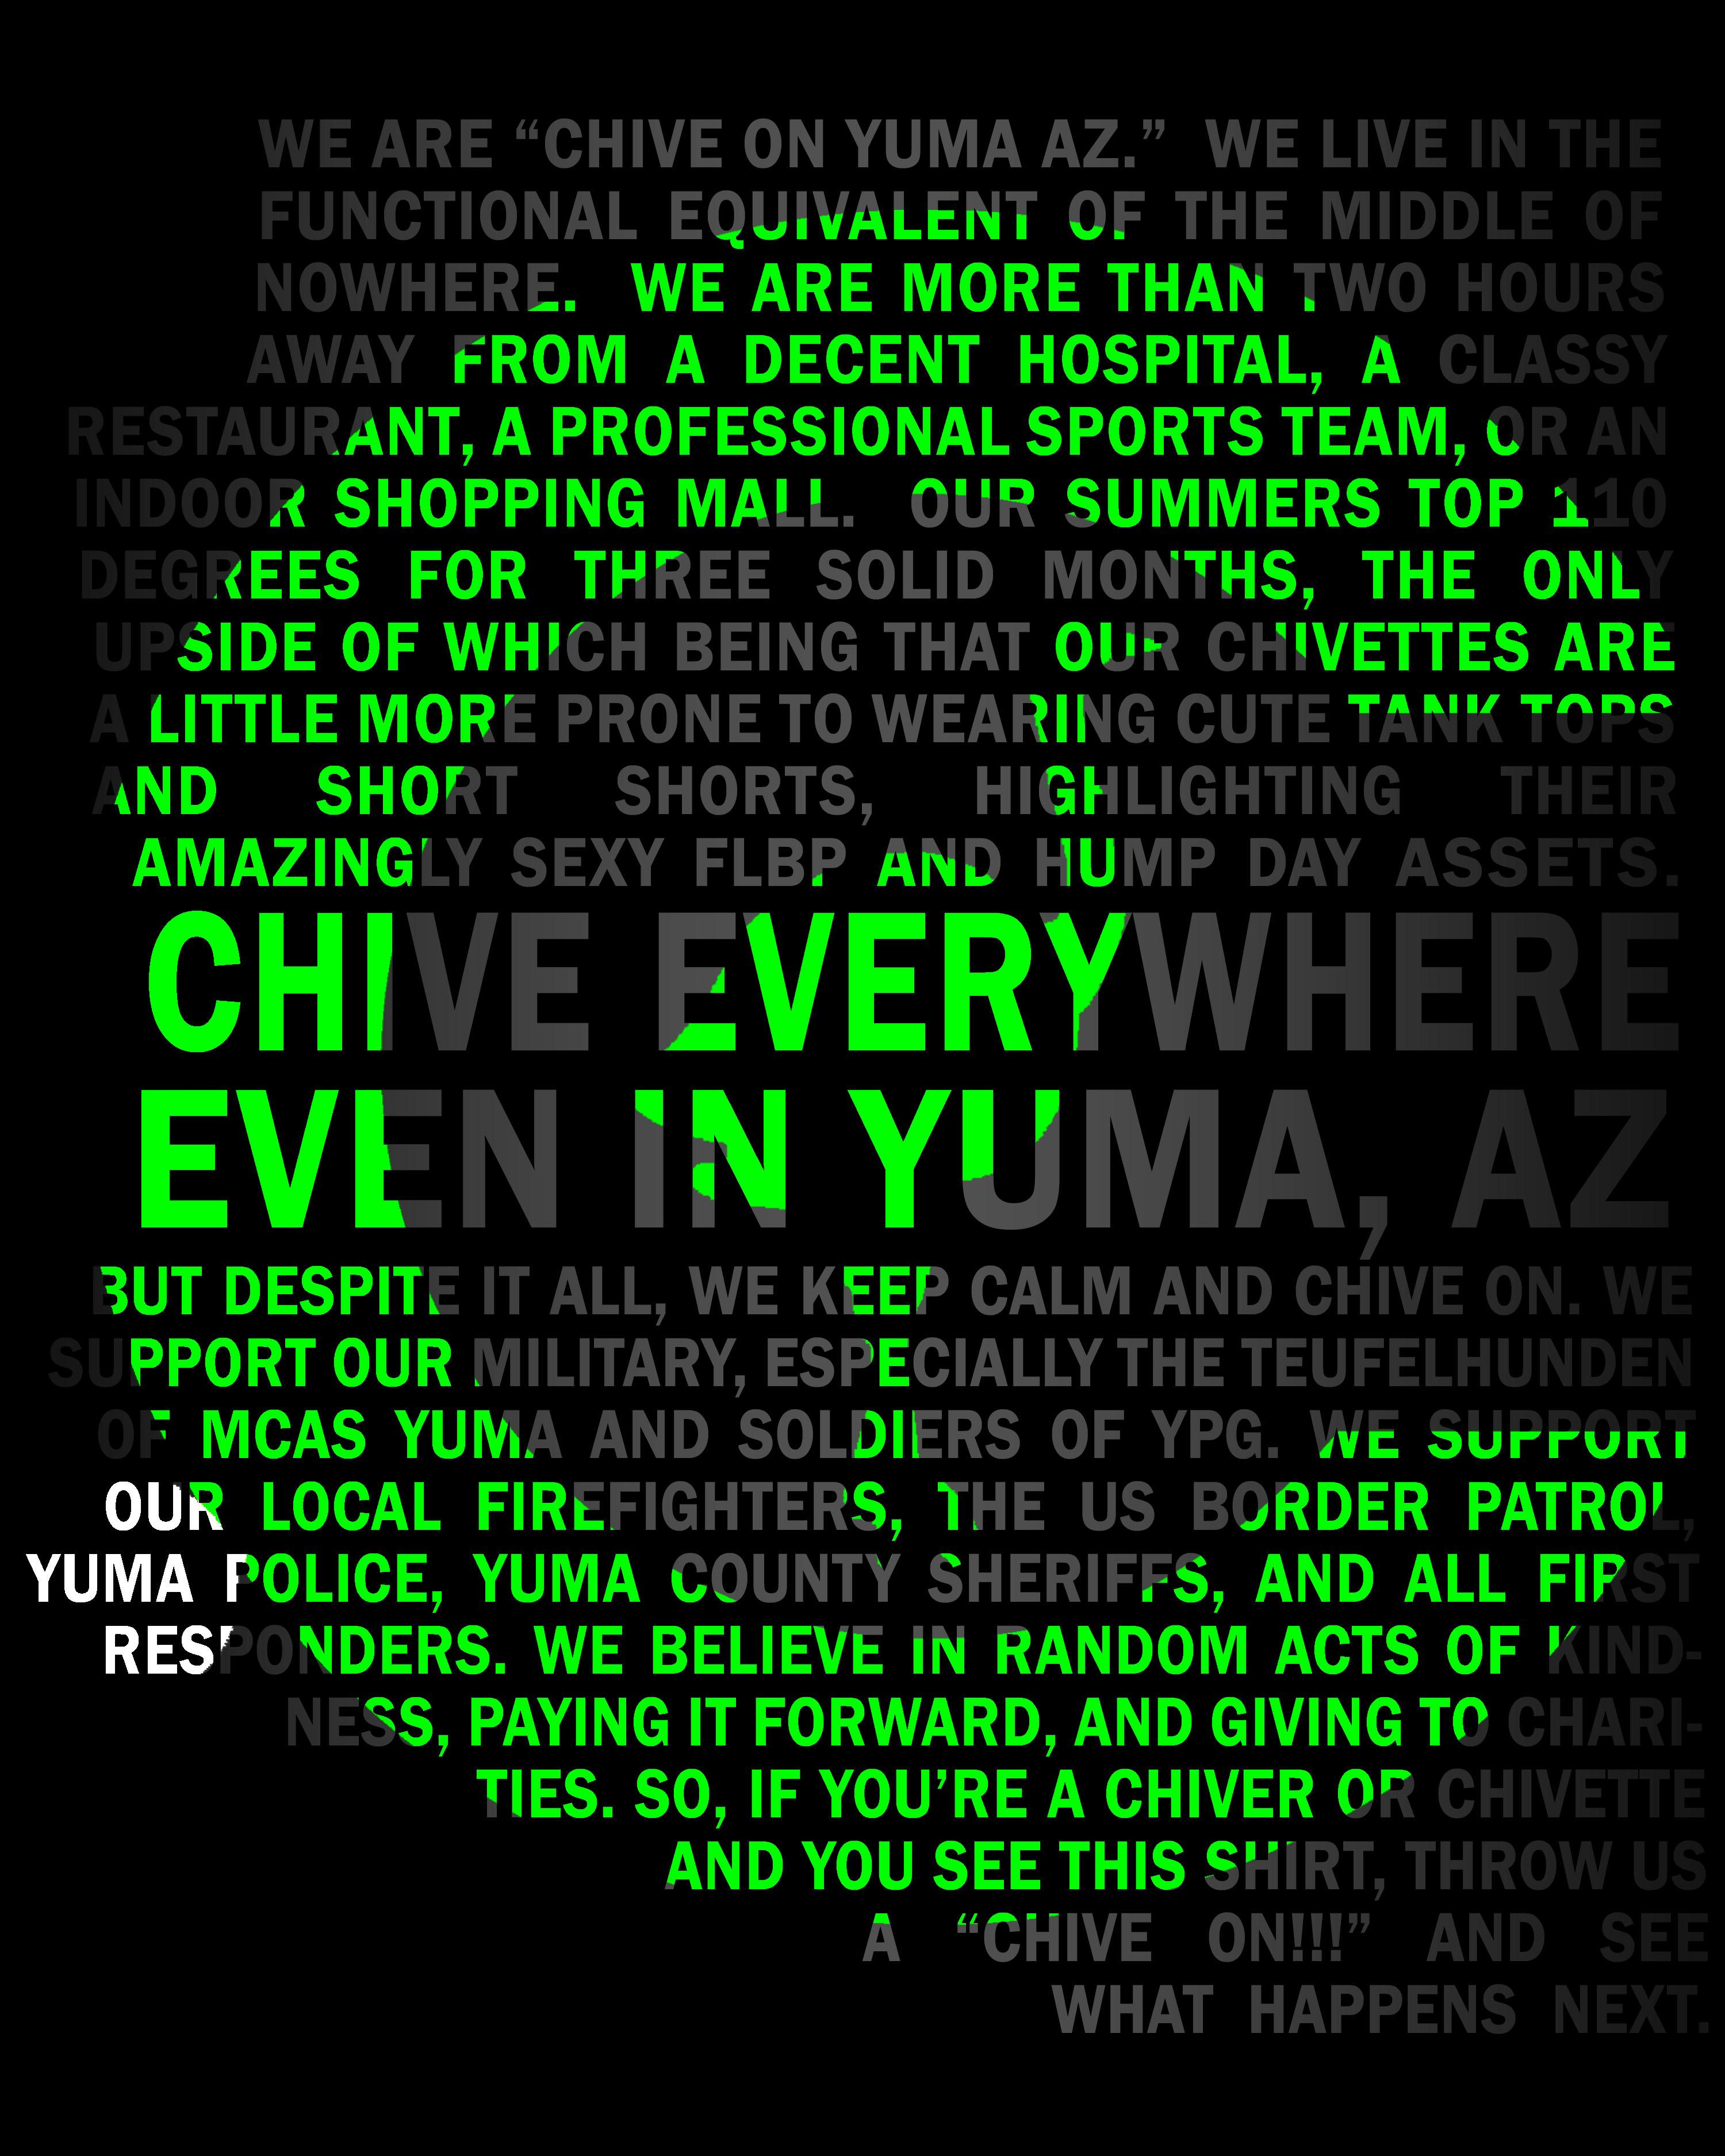 CHIVE ON YUMA AZ MENS SHIRT